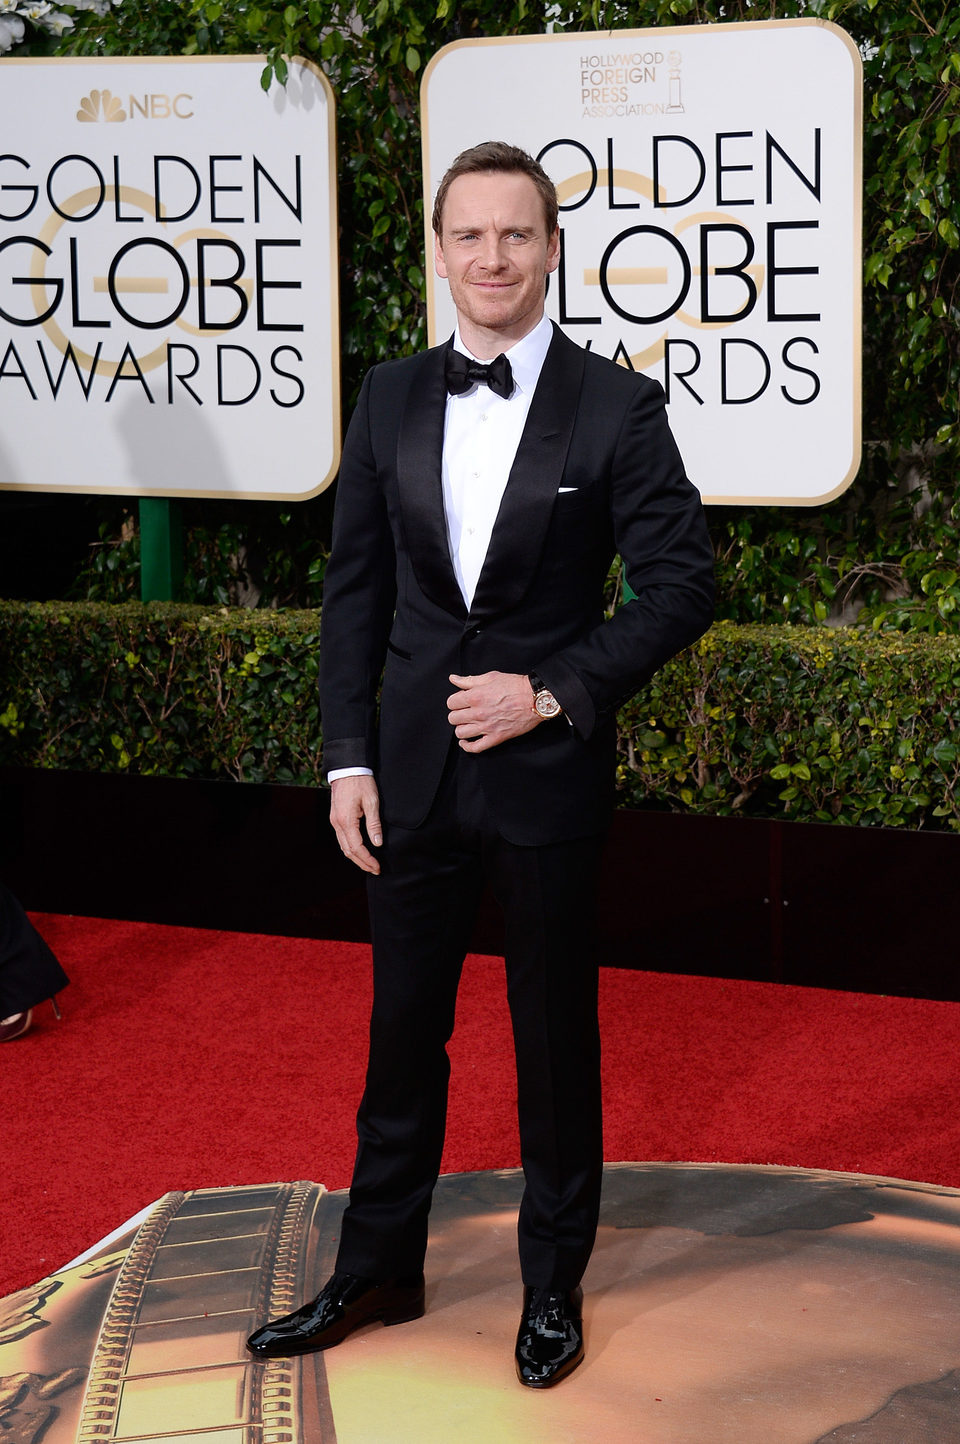 Michael Fassbender at the 2016 Golden Globes red carpet